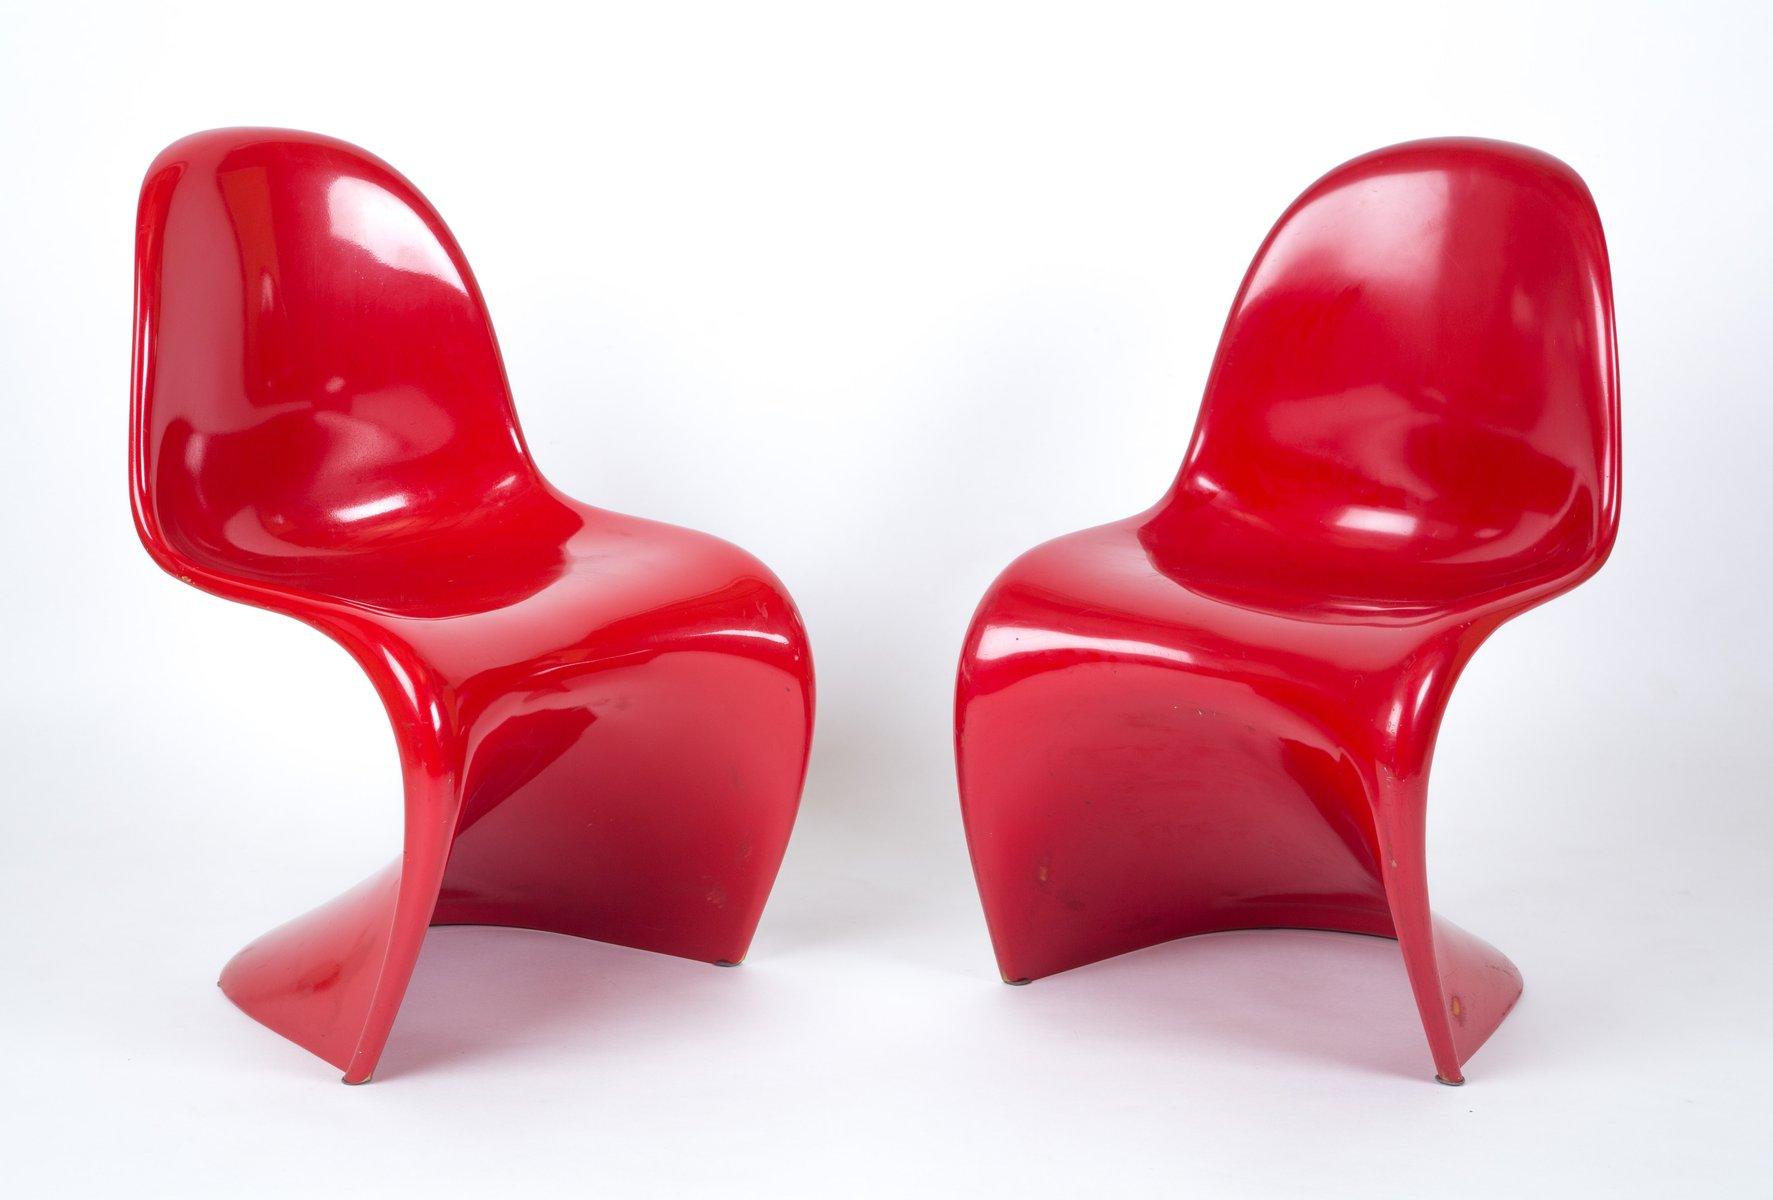 roter vintage panton stuhl von verner panton f r herman miller bei pamono kaufen. Black Bedroom Furniture Sets. Home Design Ideas